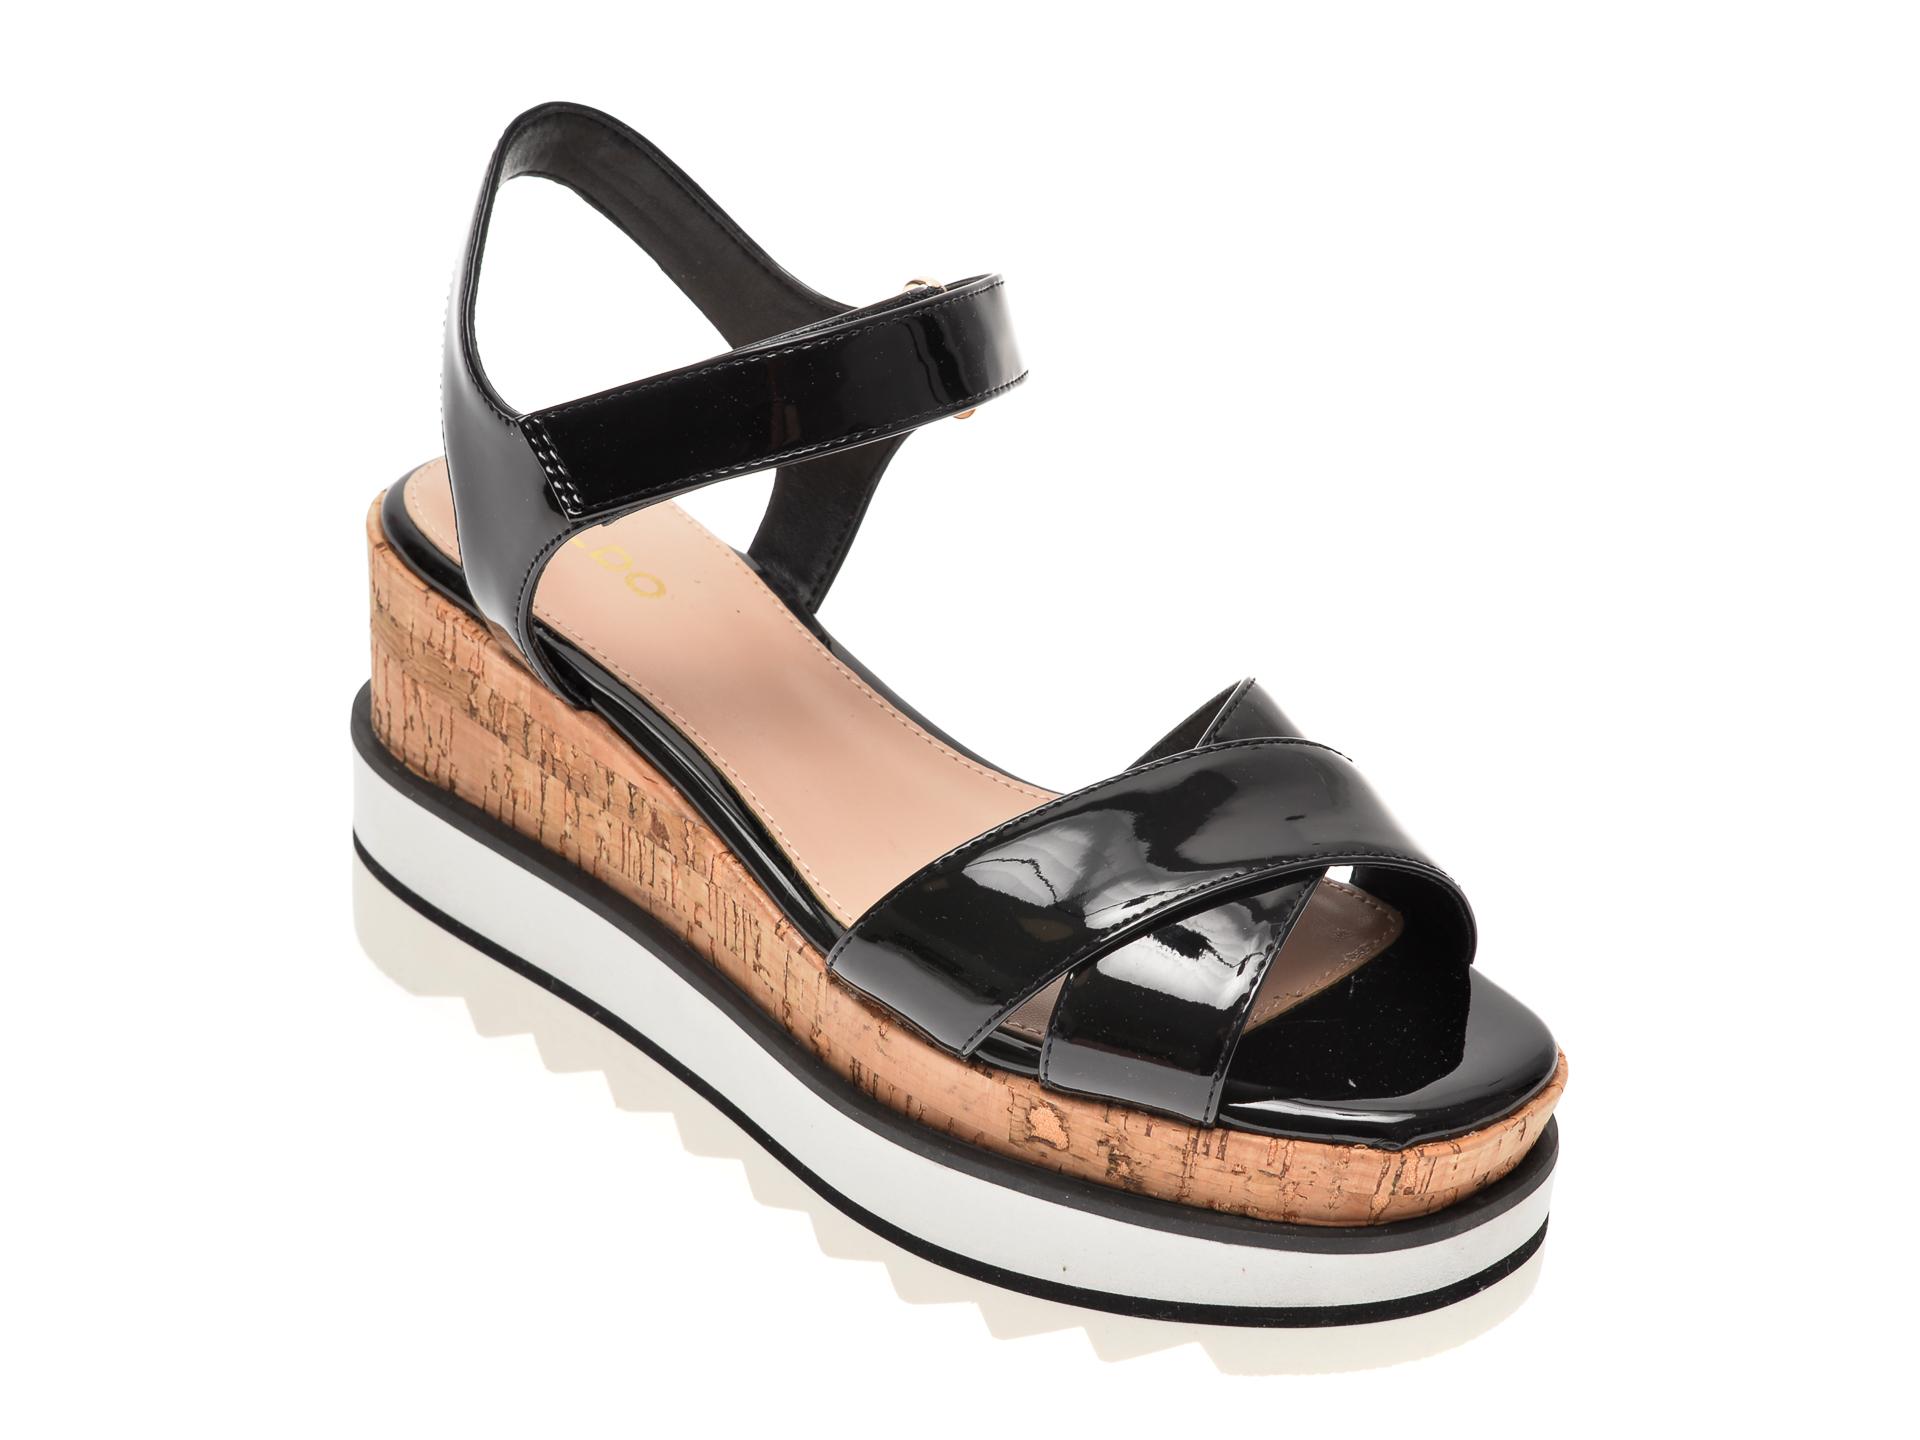 Sandale ALDO negre, Sassy001, din piele ecologica